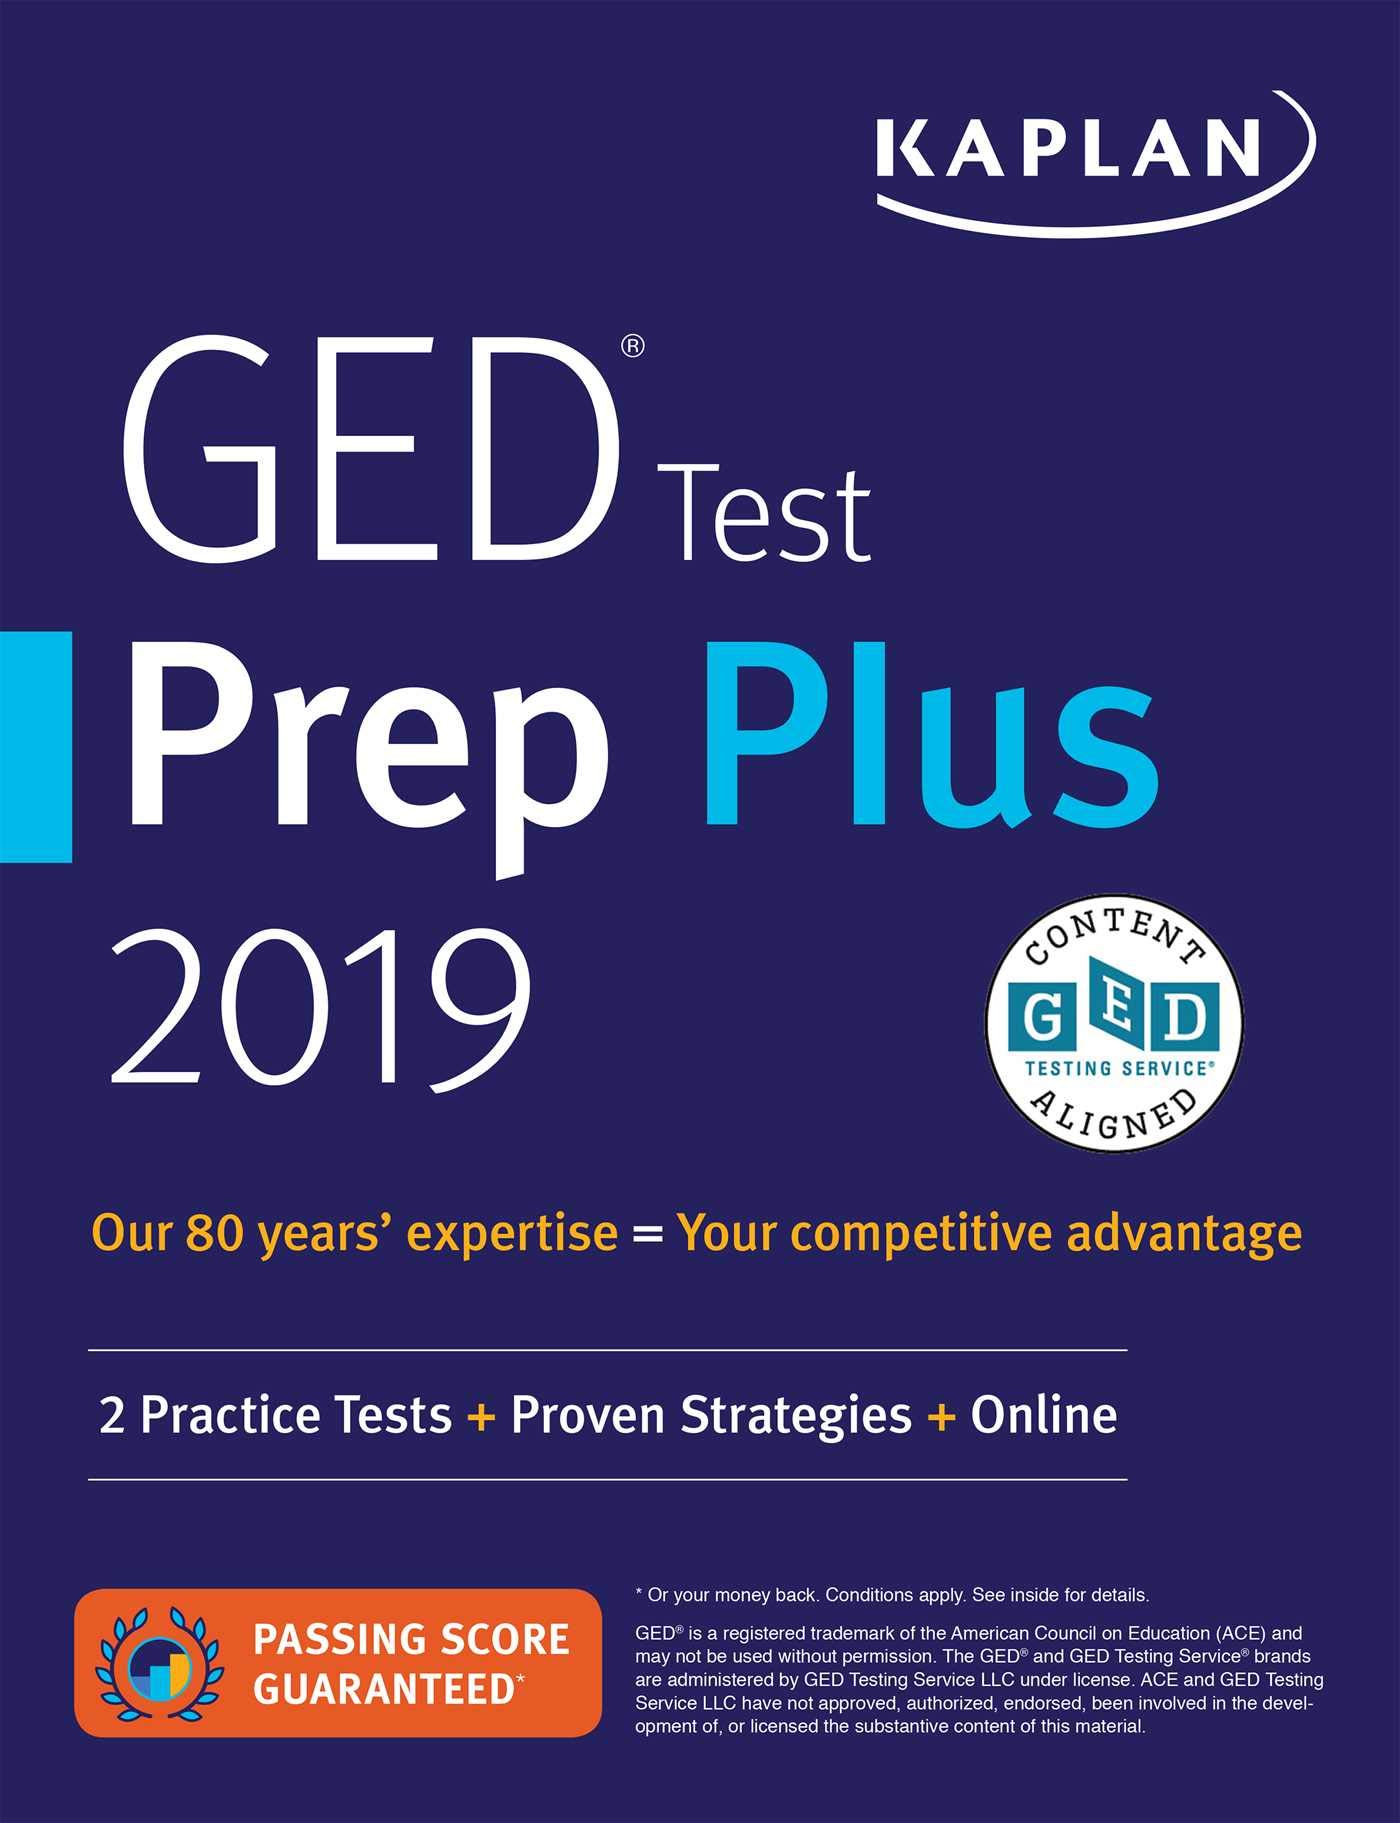 GED Test Prep Plus 2019: 2 Practice Tests + Proven Strategies + Online (Kaplan Test Prep) by Kaplan Publishing